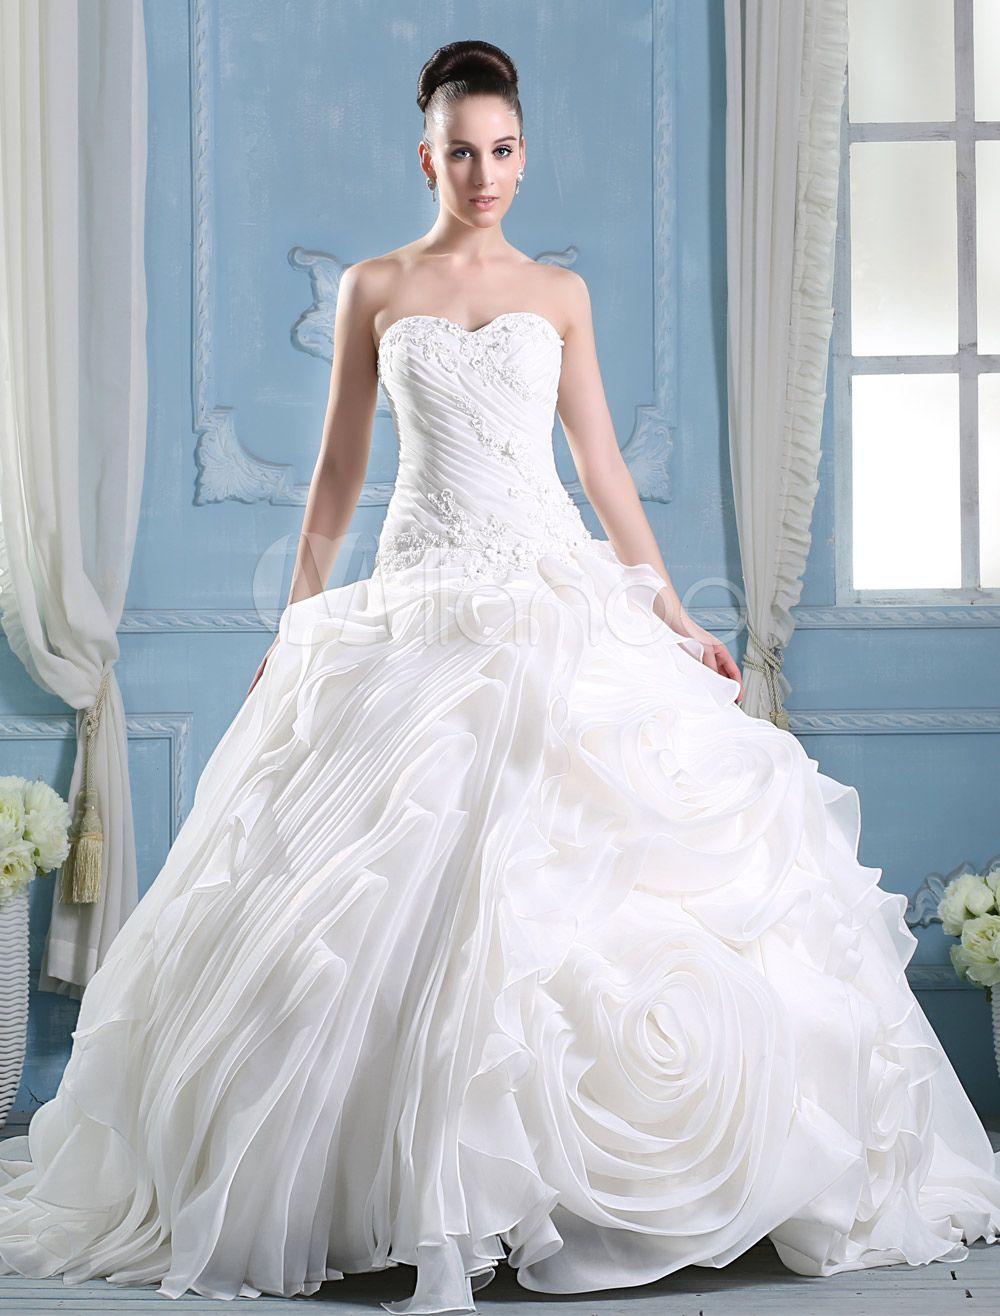 Ivory Sweetheart Neck A-line Strapless Flower Wedding Dress ...